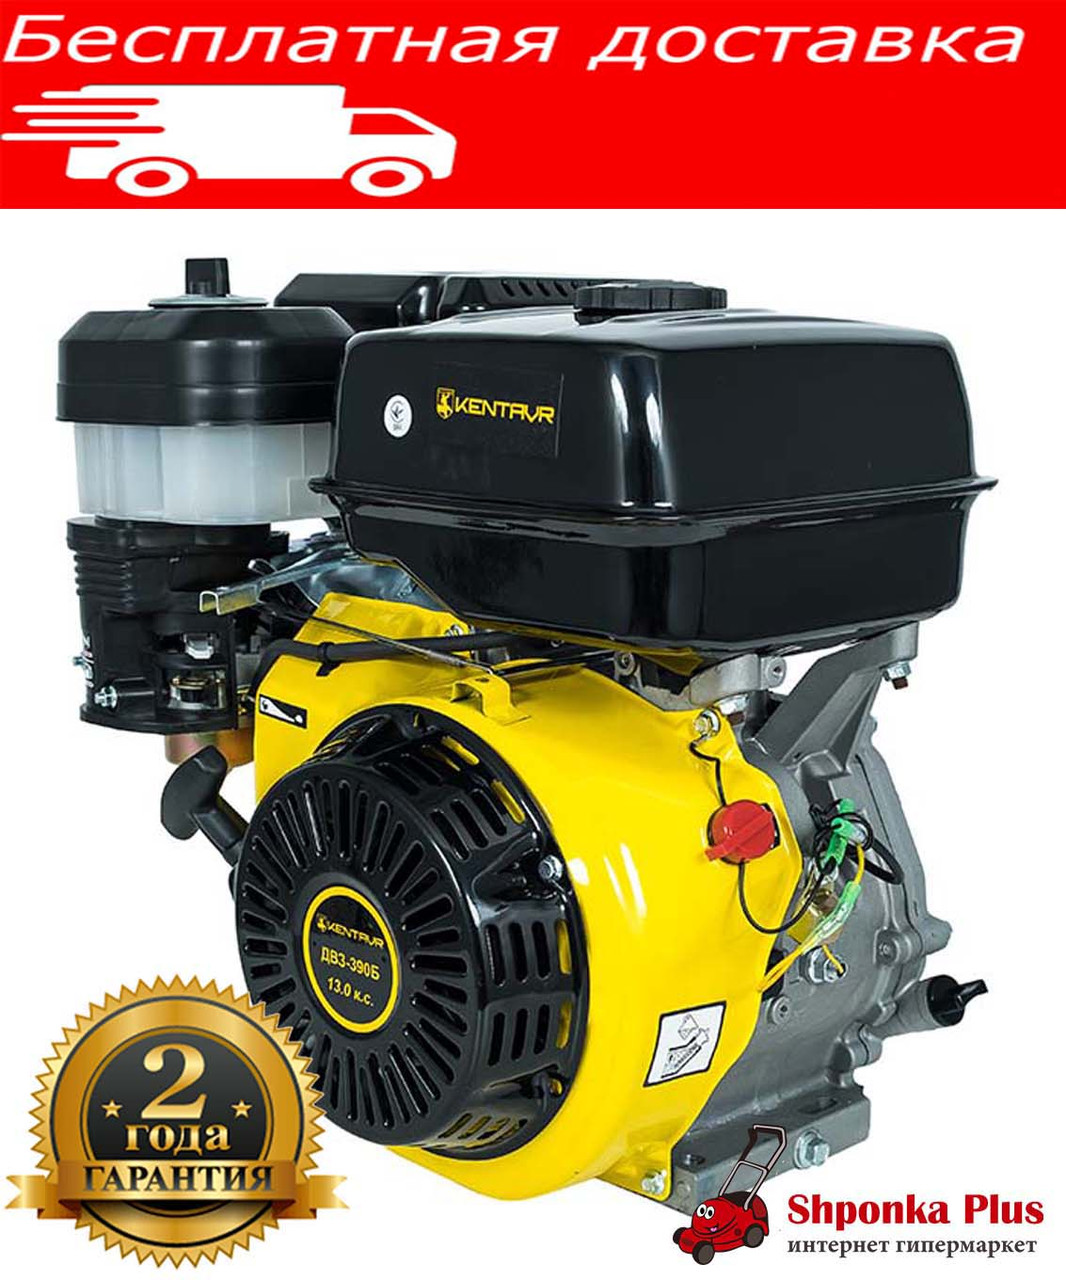 Двигатель Кентавр ДВЗ-390Б бензиновый 13 л.с. шпонка